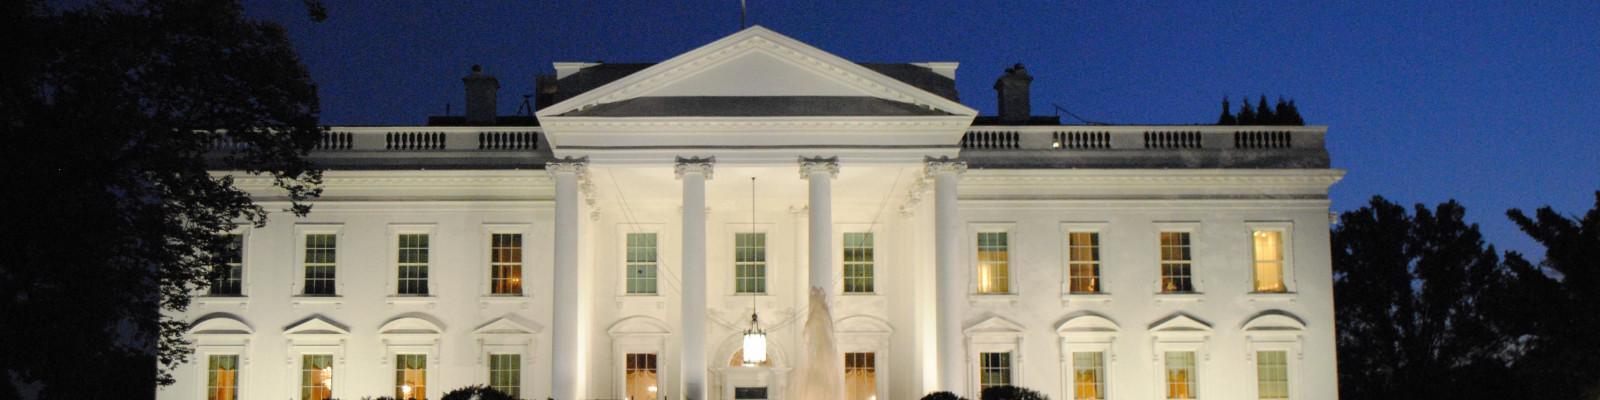 White House credit splash/Tabrez Syed